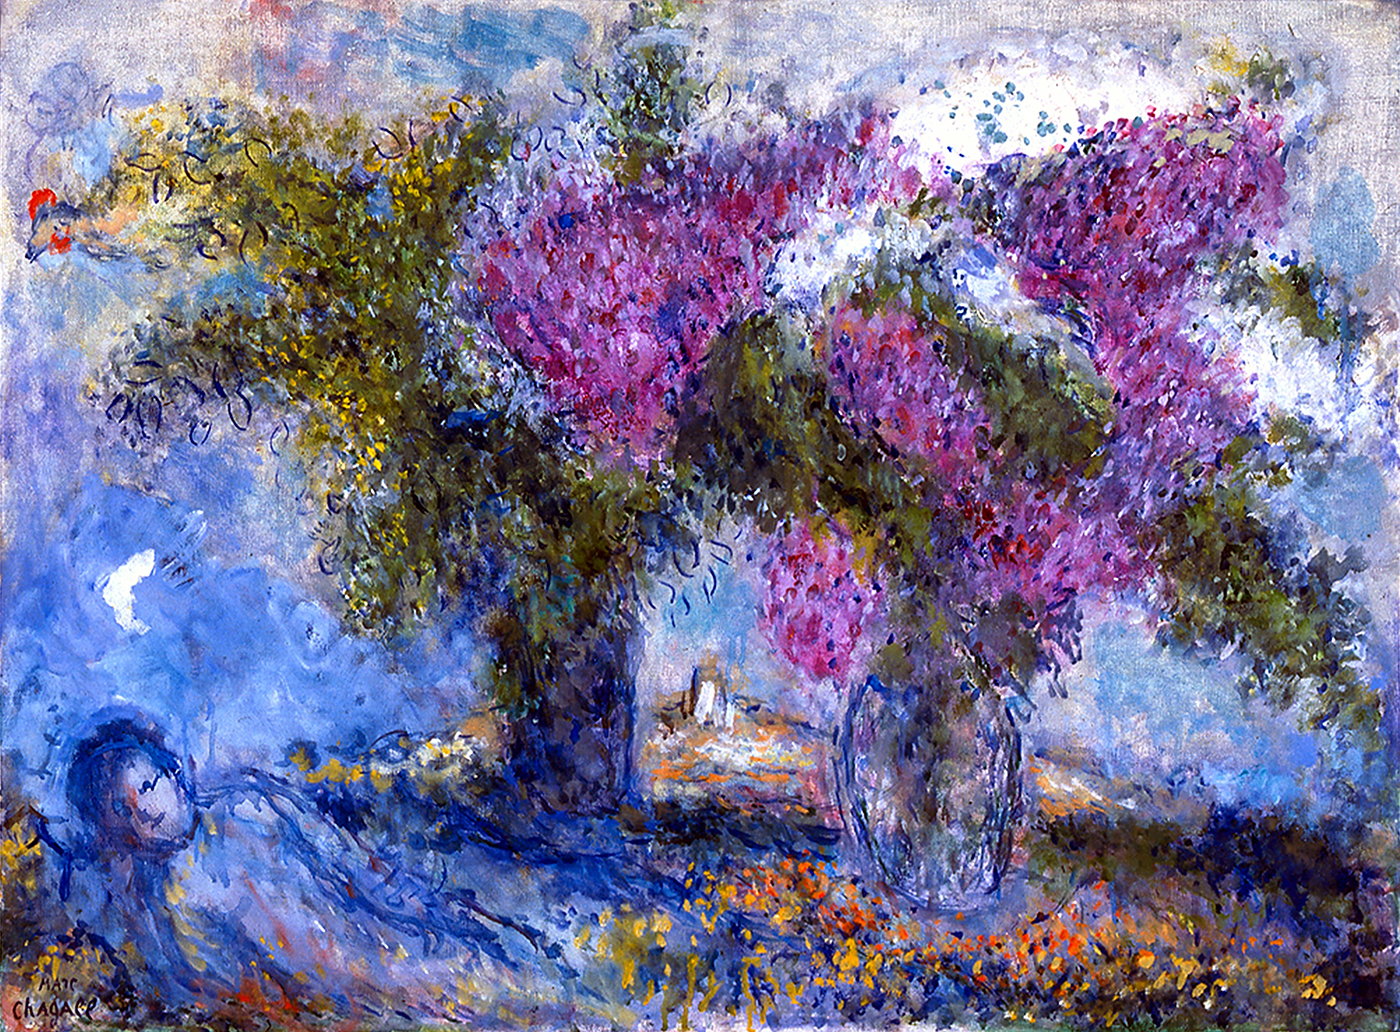 A Botanical Garden Blooms with Chagall Artes & contextos bouquet of lilacs